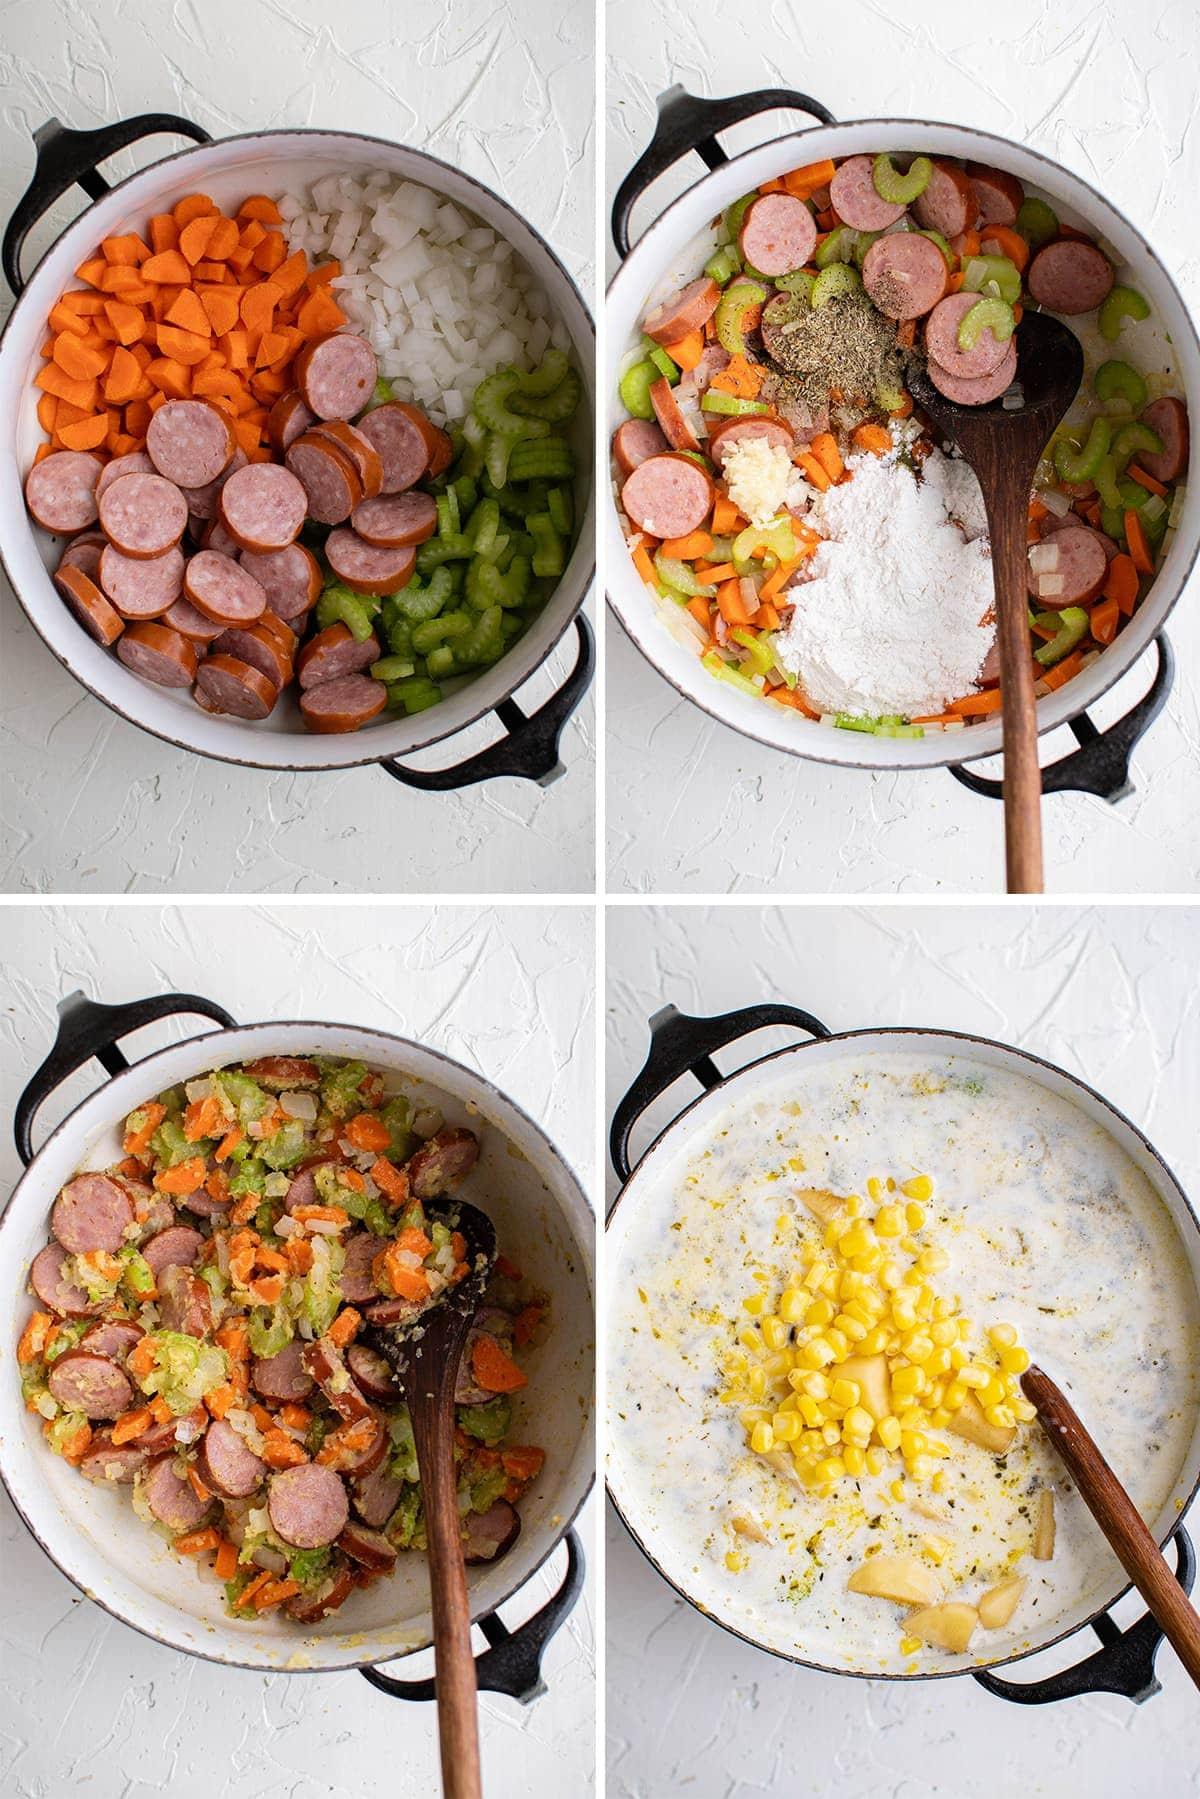 Steps for making sausage and potato soup